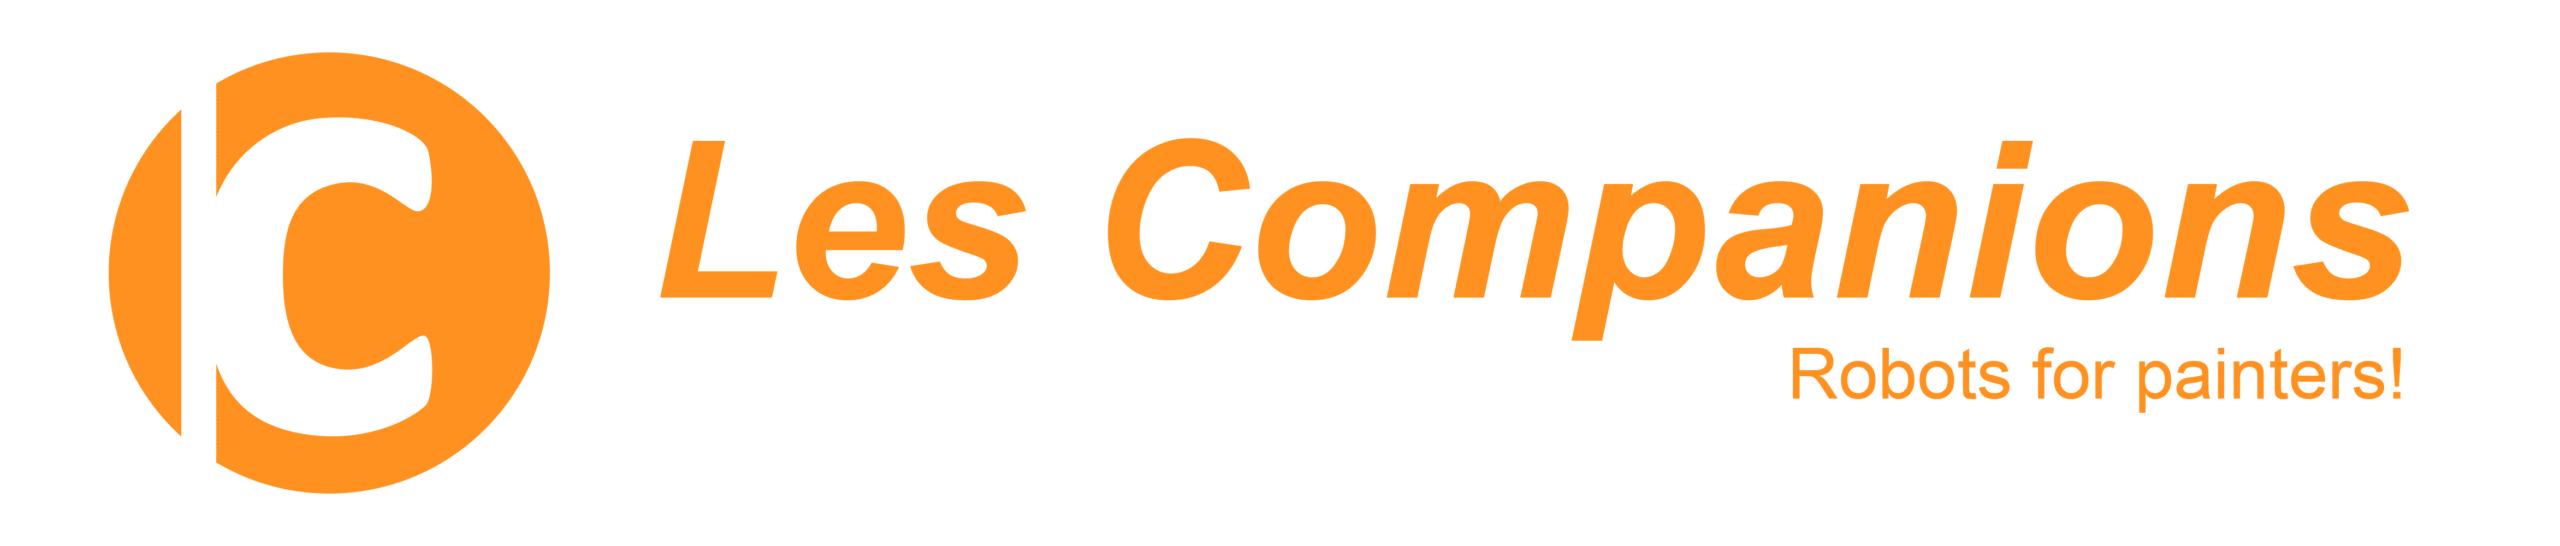 Les Companions